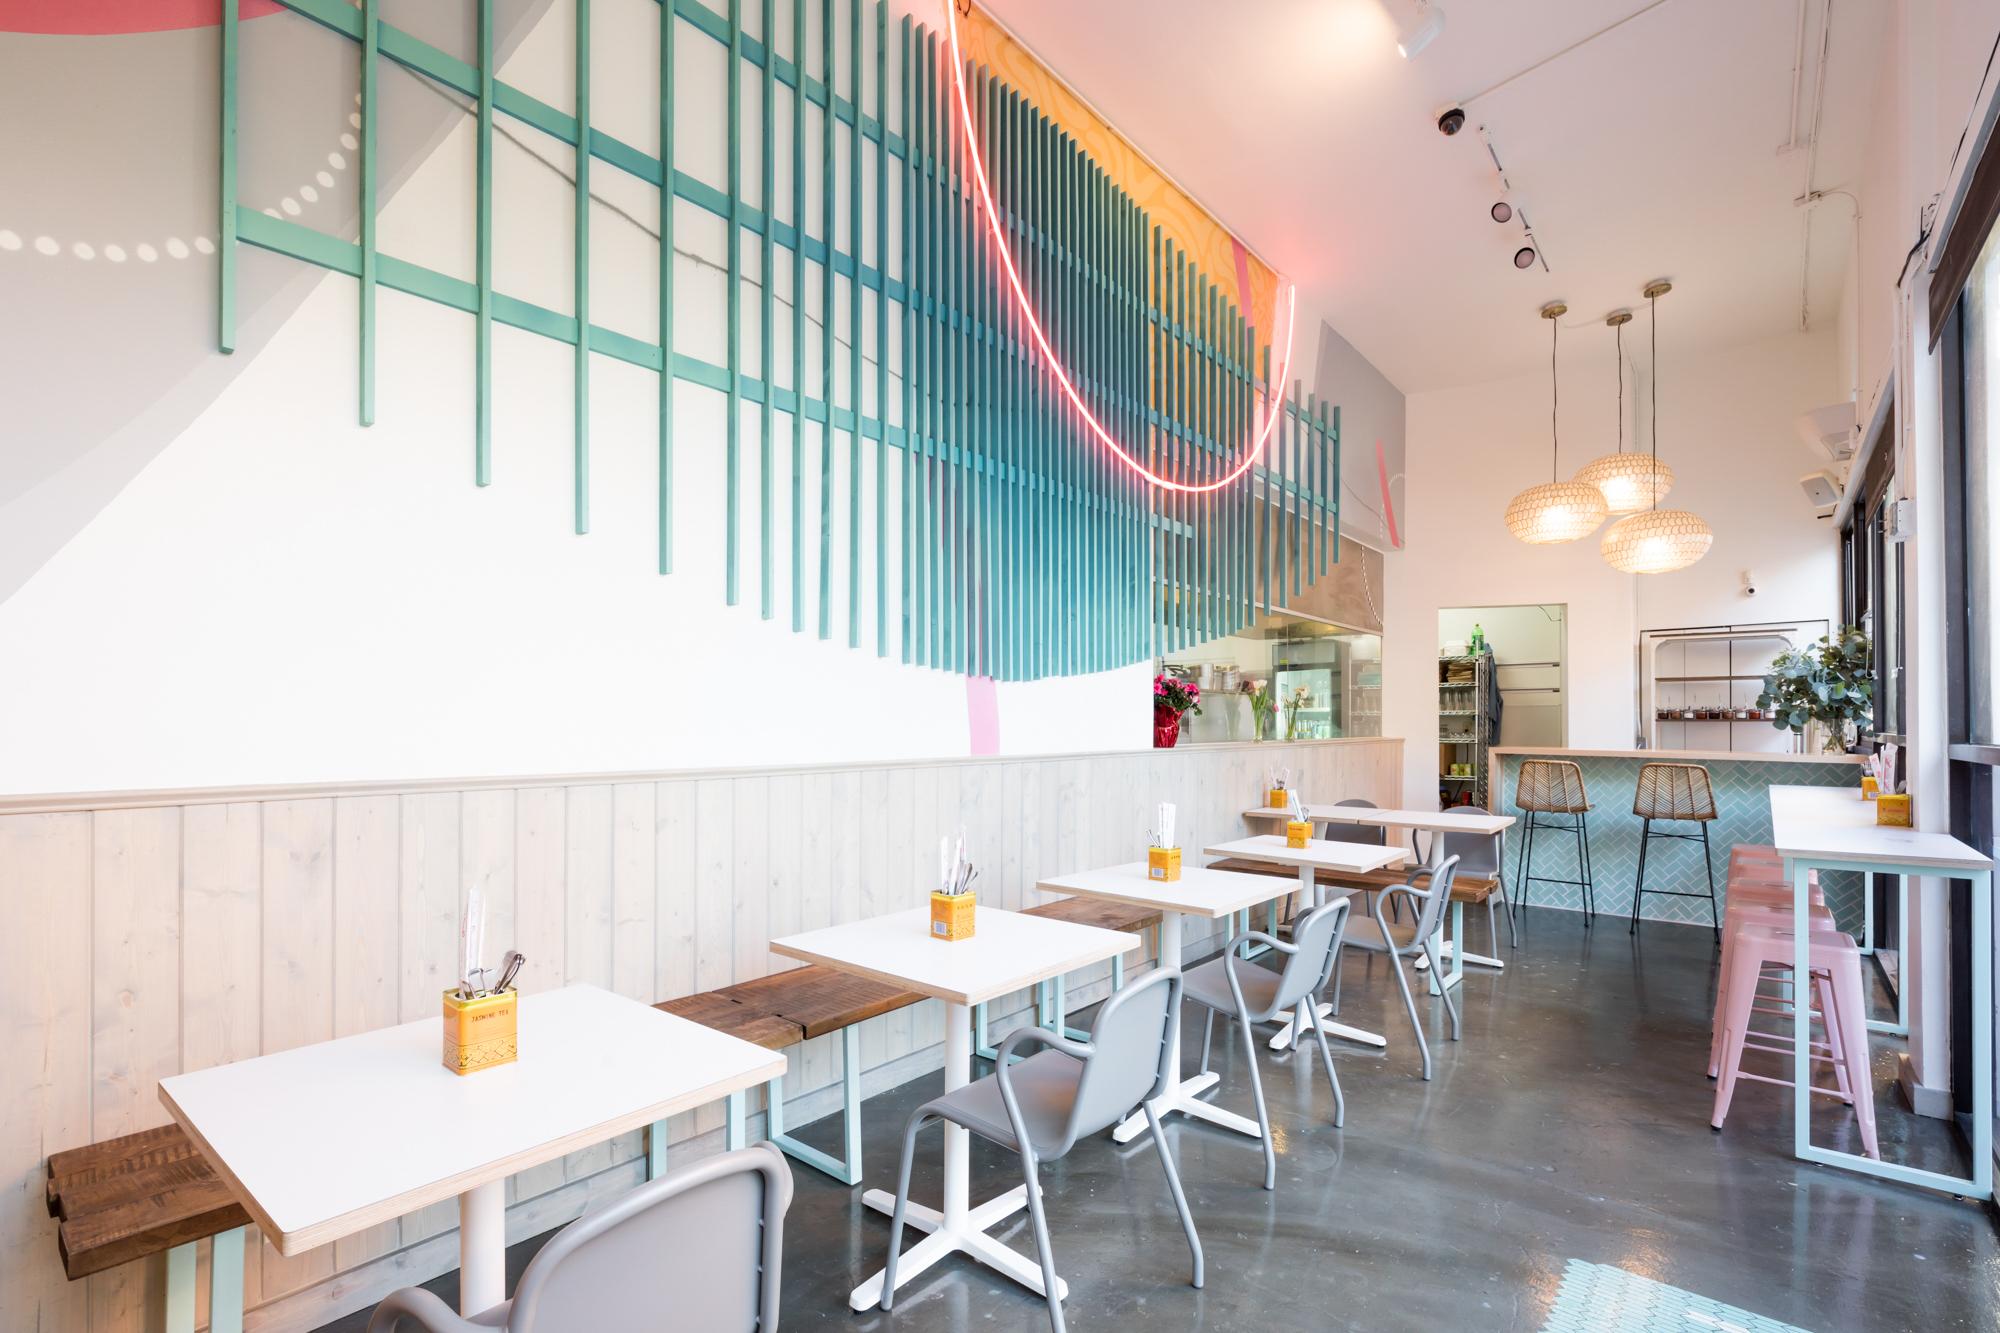 The interior of the restaurant Nyum Bai in Oakland.